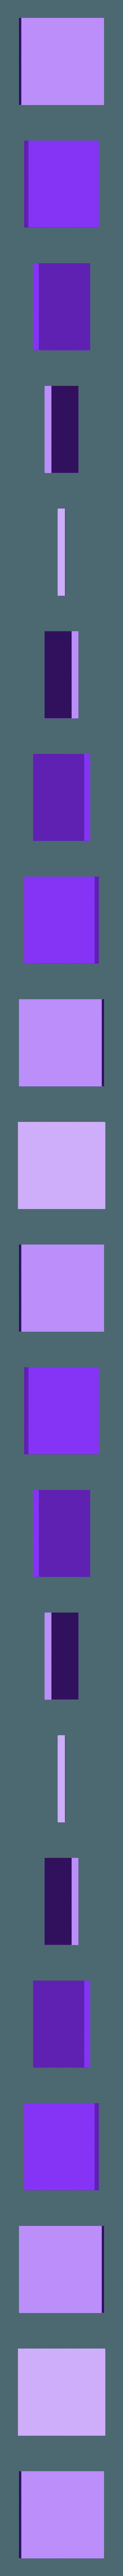 face_tile.stl Download free STL file Rubik's Cube Remixed • 3D printable design, lowboydrvr